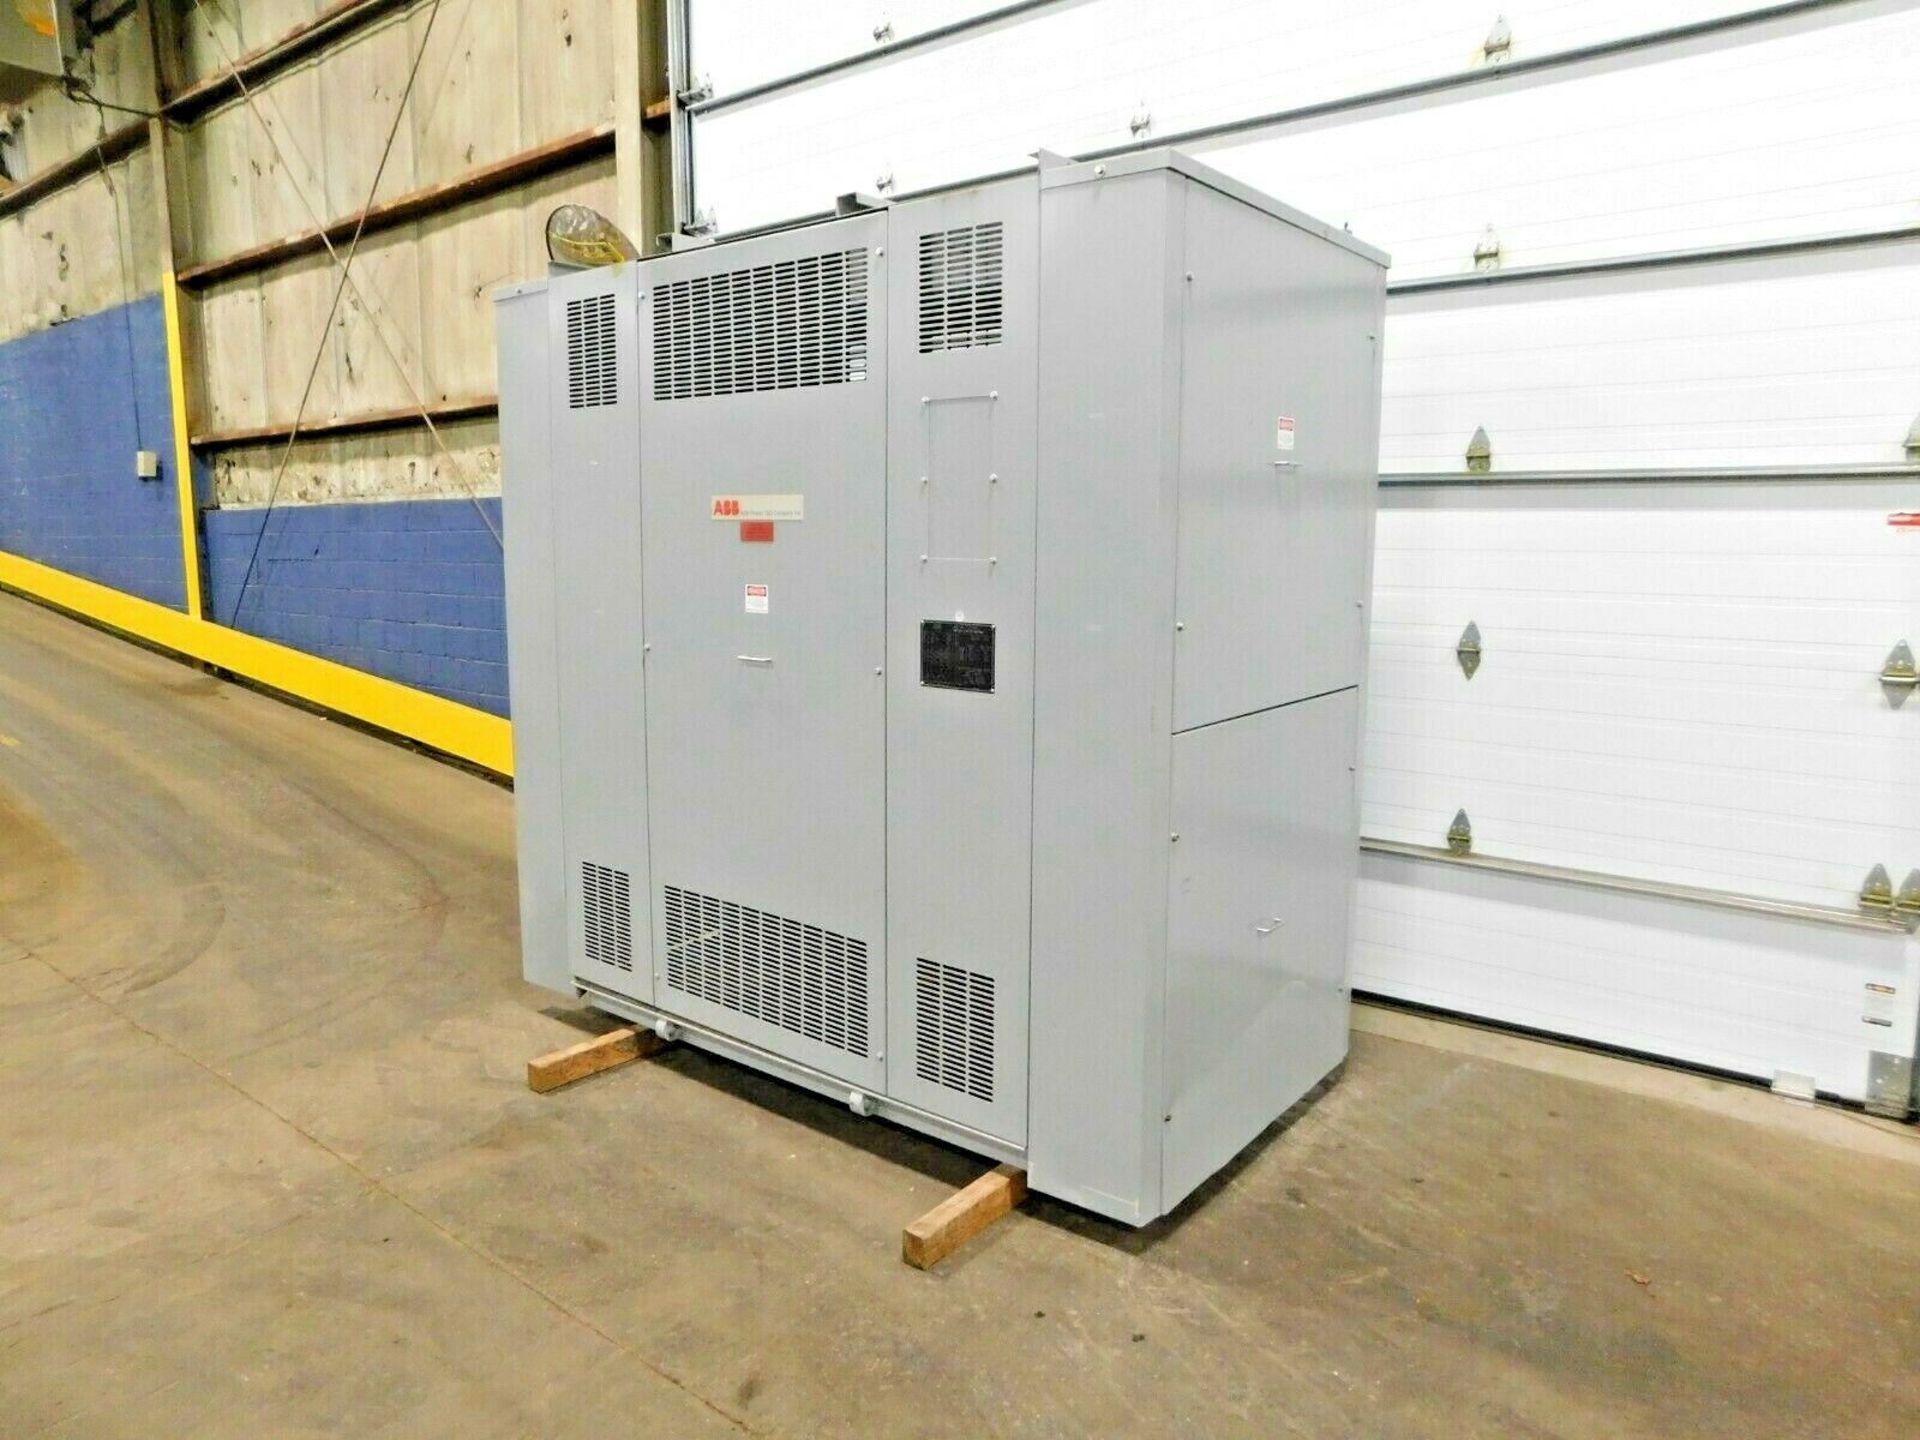 ABB 500 KVA Dry Type Transformer. 3 Ph. 4160 HV. 480 LV. 60 Hz. - Image 3 of 5